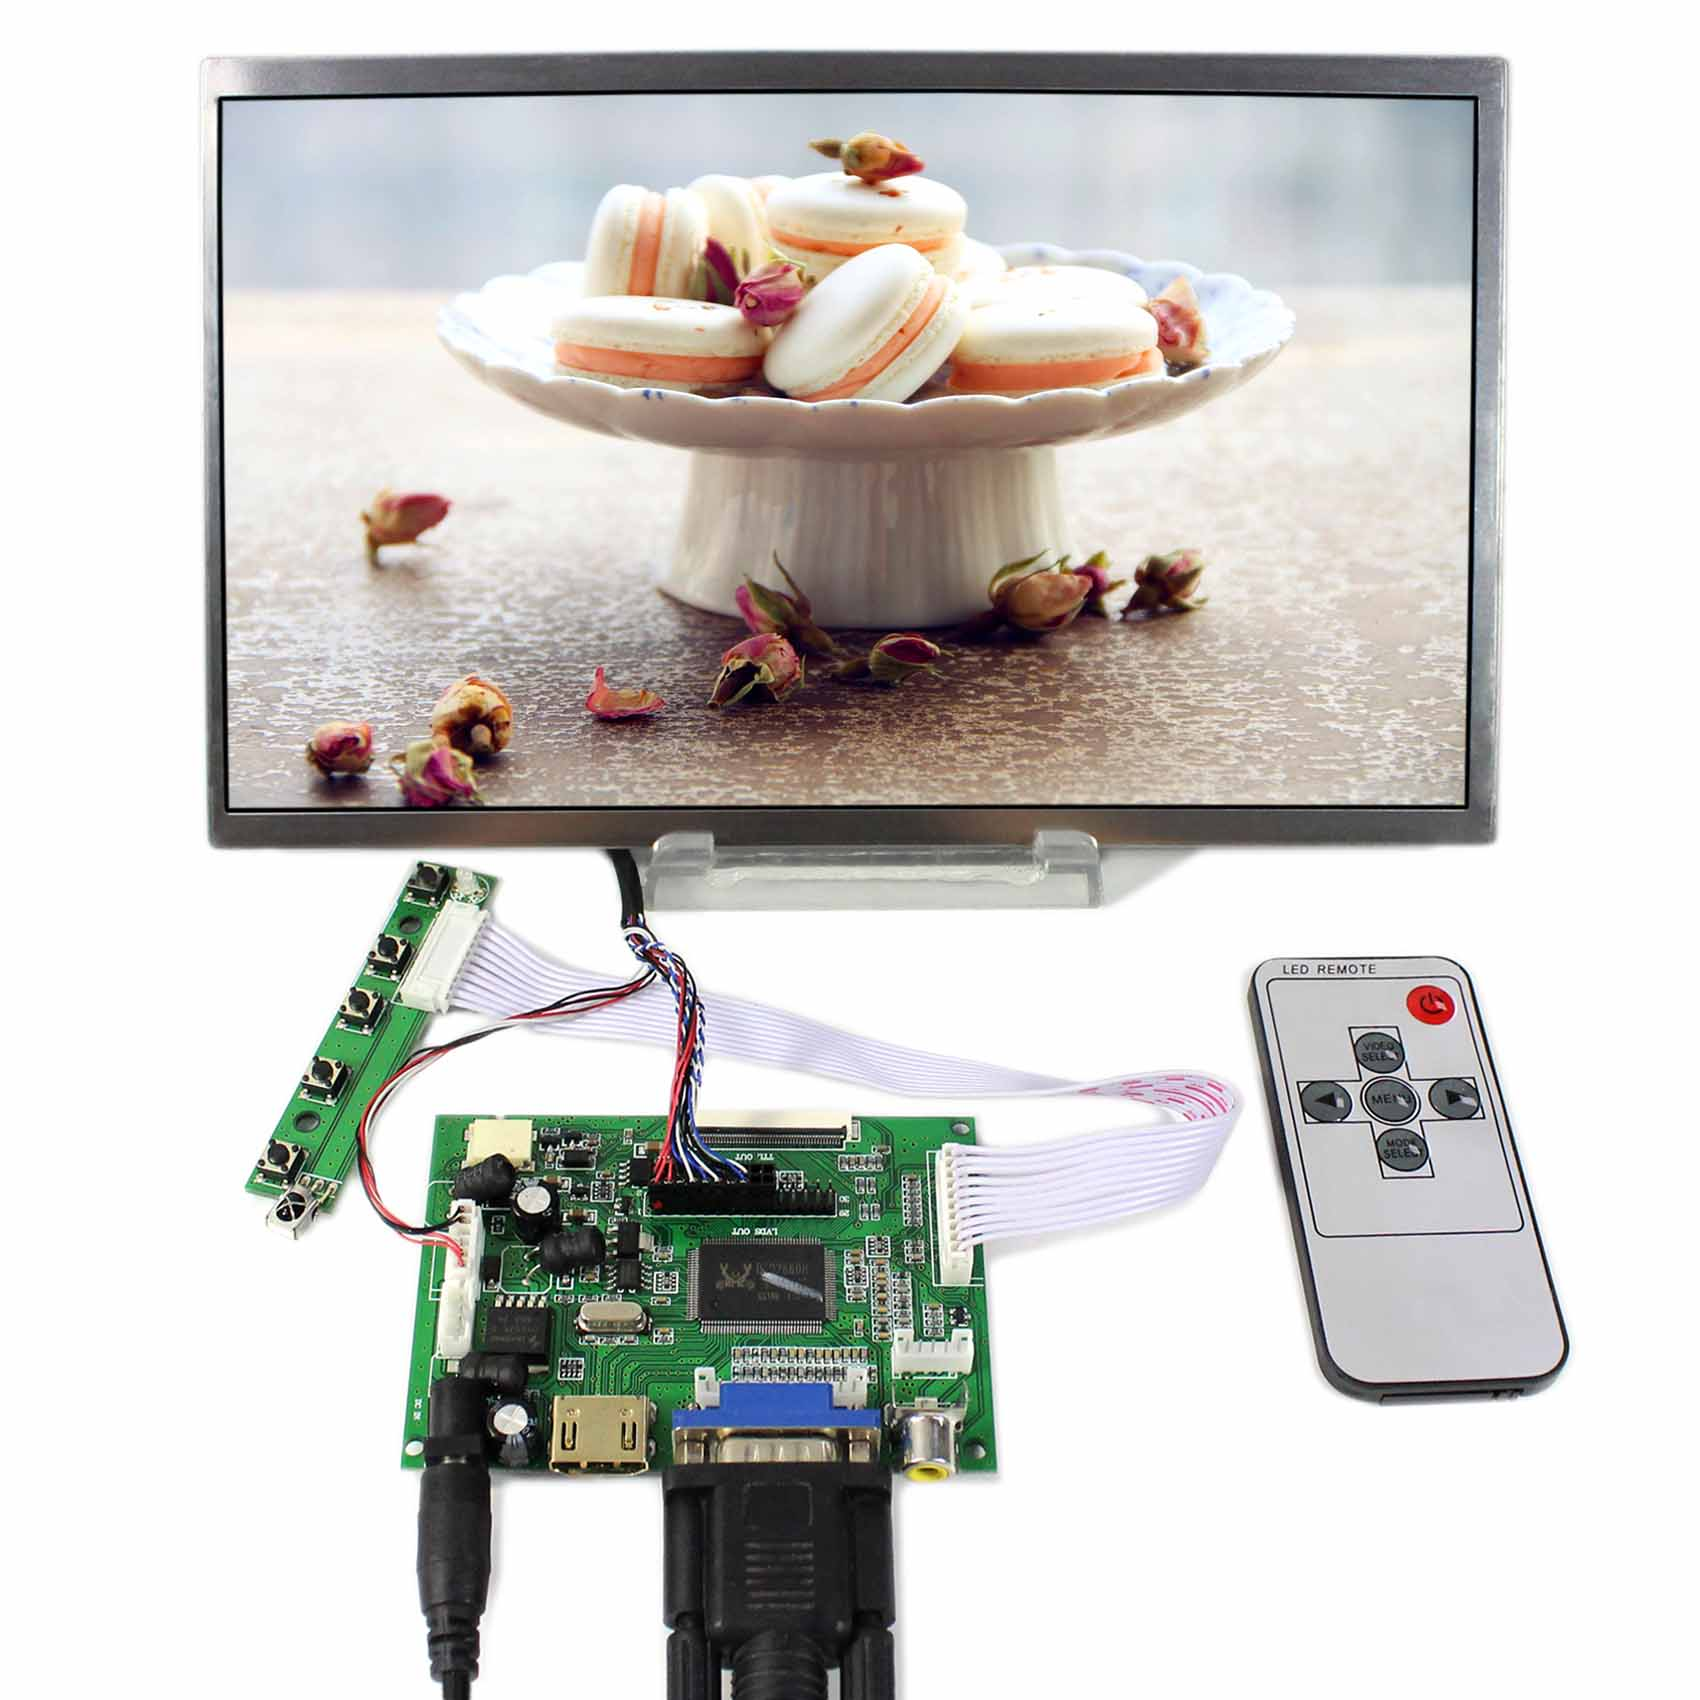 LTN101NT02 B101AW03 N101L6 LP101WS 10.1 LCD Screen 1024X600 LCD Controller Board HDMI VGA CVBSLTN101NT02 B101AW03 N101L6 LP101WS 10.1 LCD Screen 1024X600 LCD Controller Board HDMI VGA CVBS